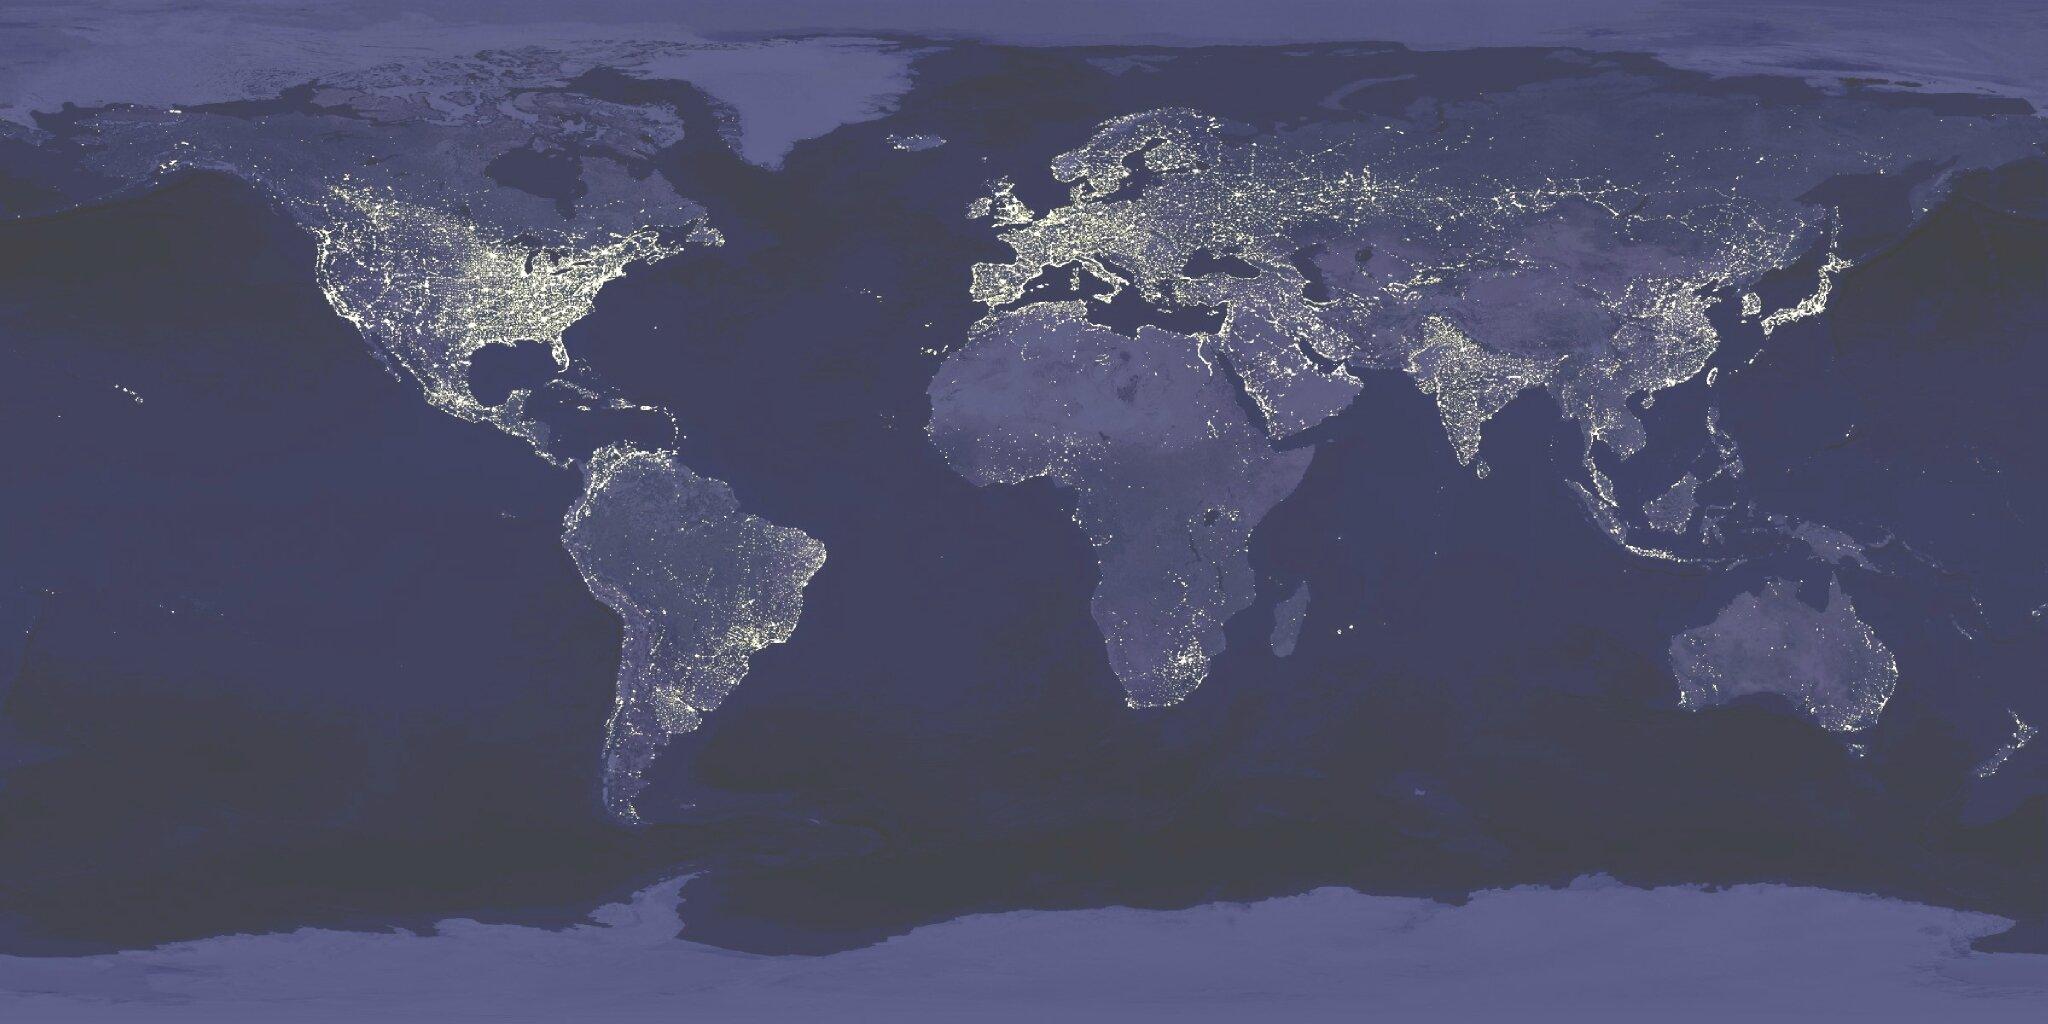 world_at_night pollution lumineuse biodiversité nocturne